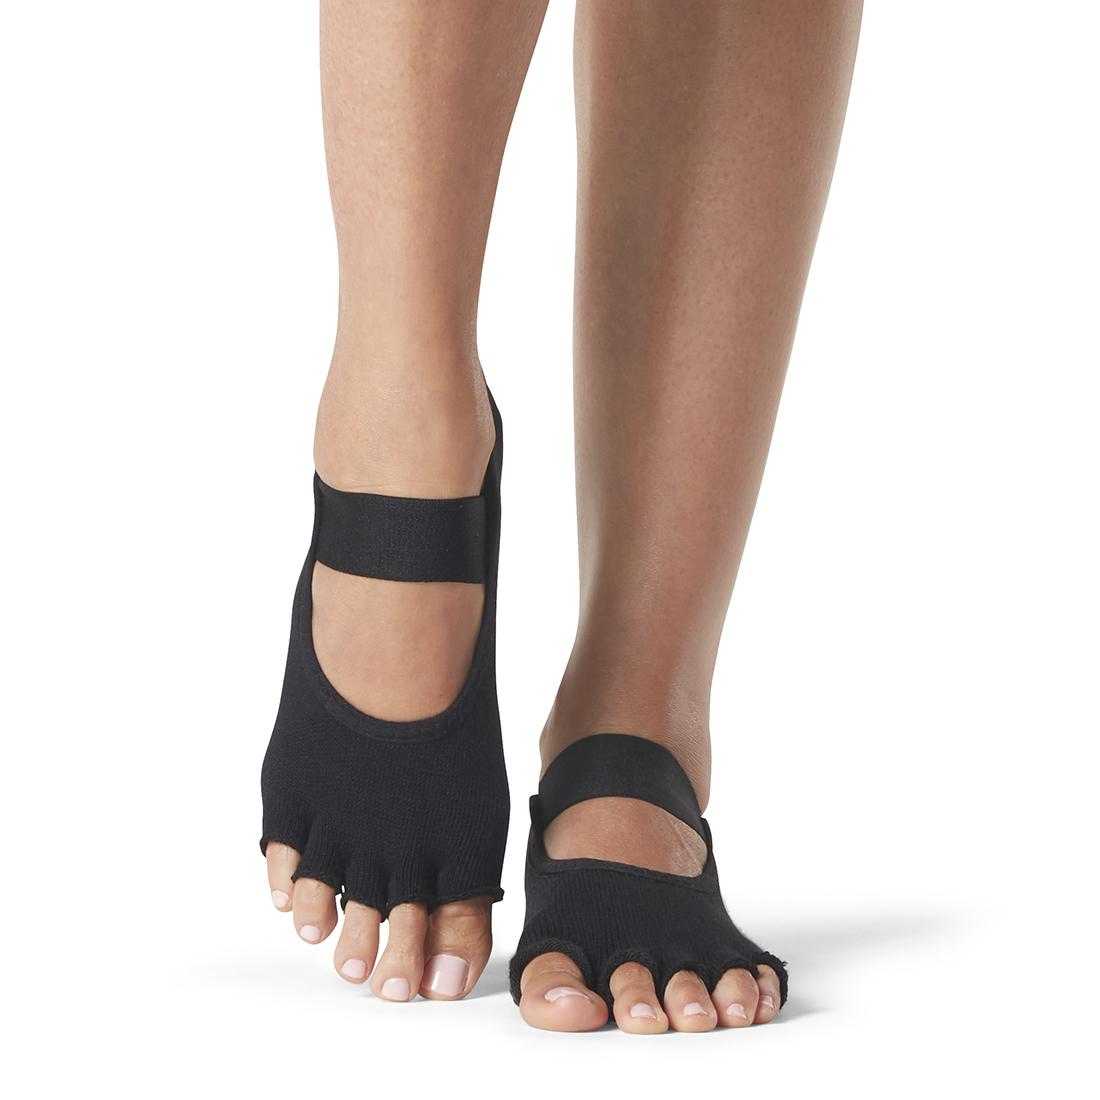 ToeSox Mia Half Toe Black - 1